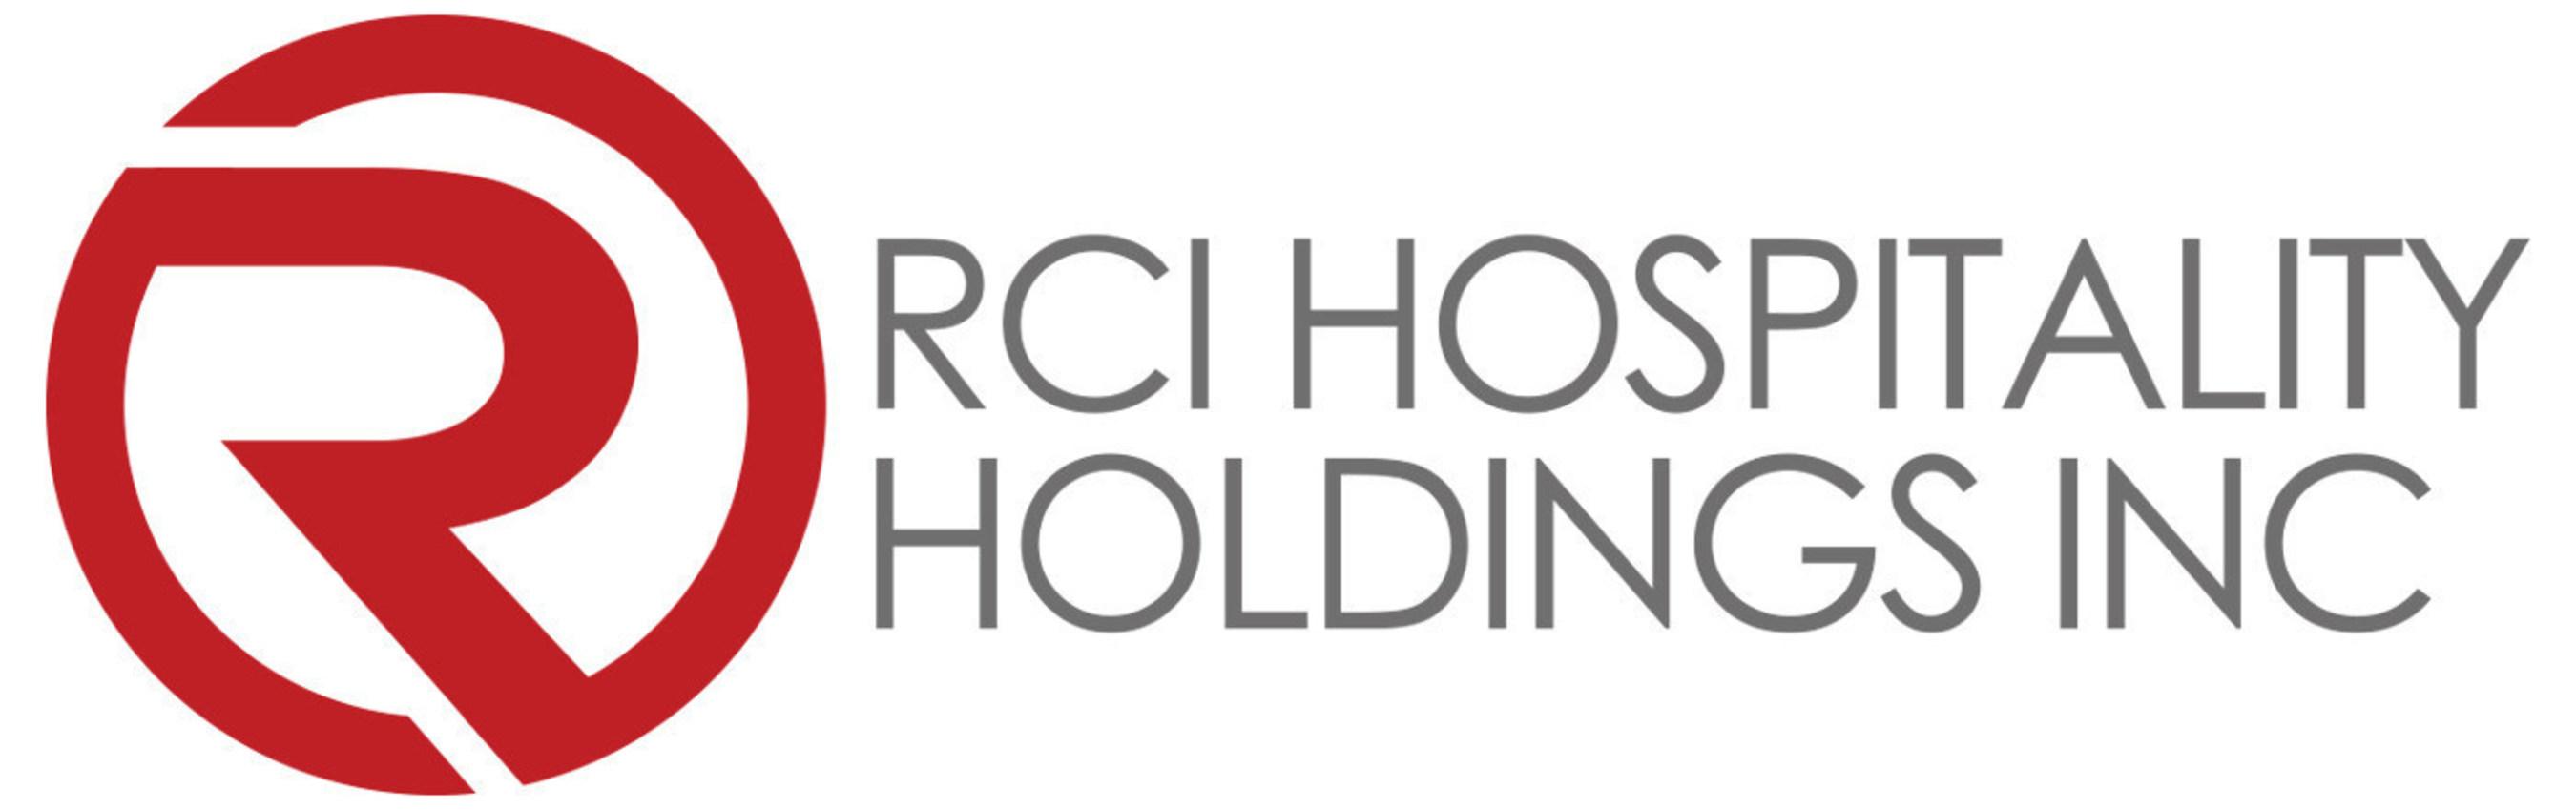 RCI HOSPITALITY HOLDINGS INC